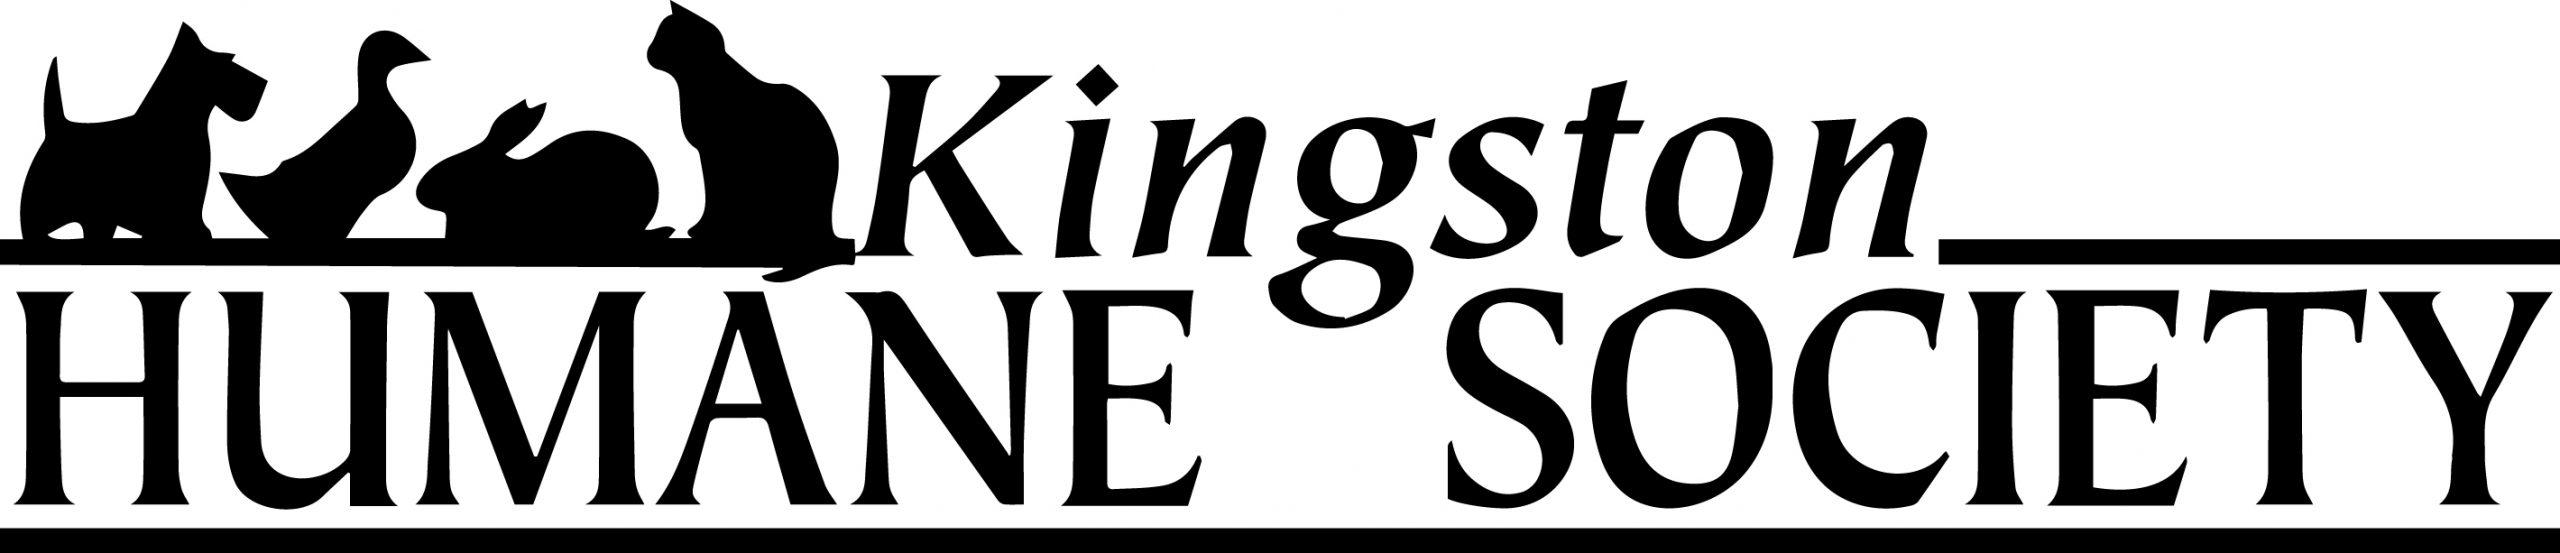 Kingston Humane Society